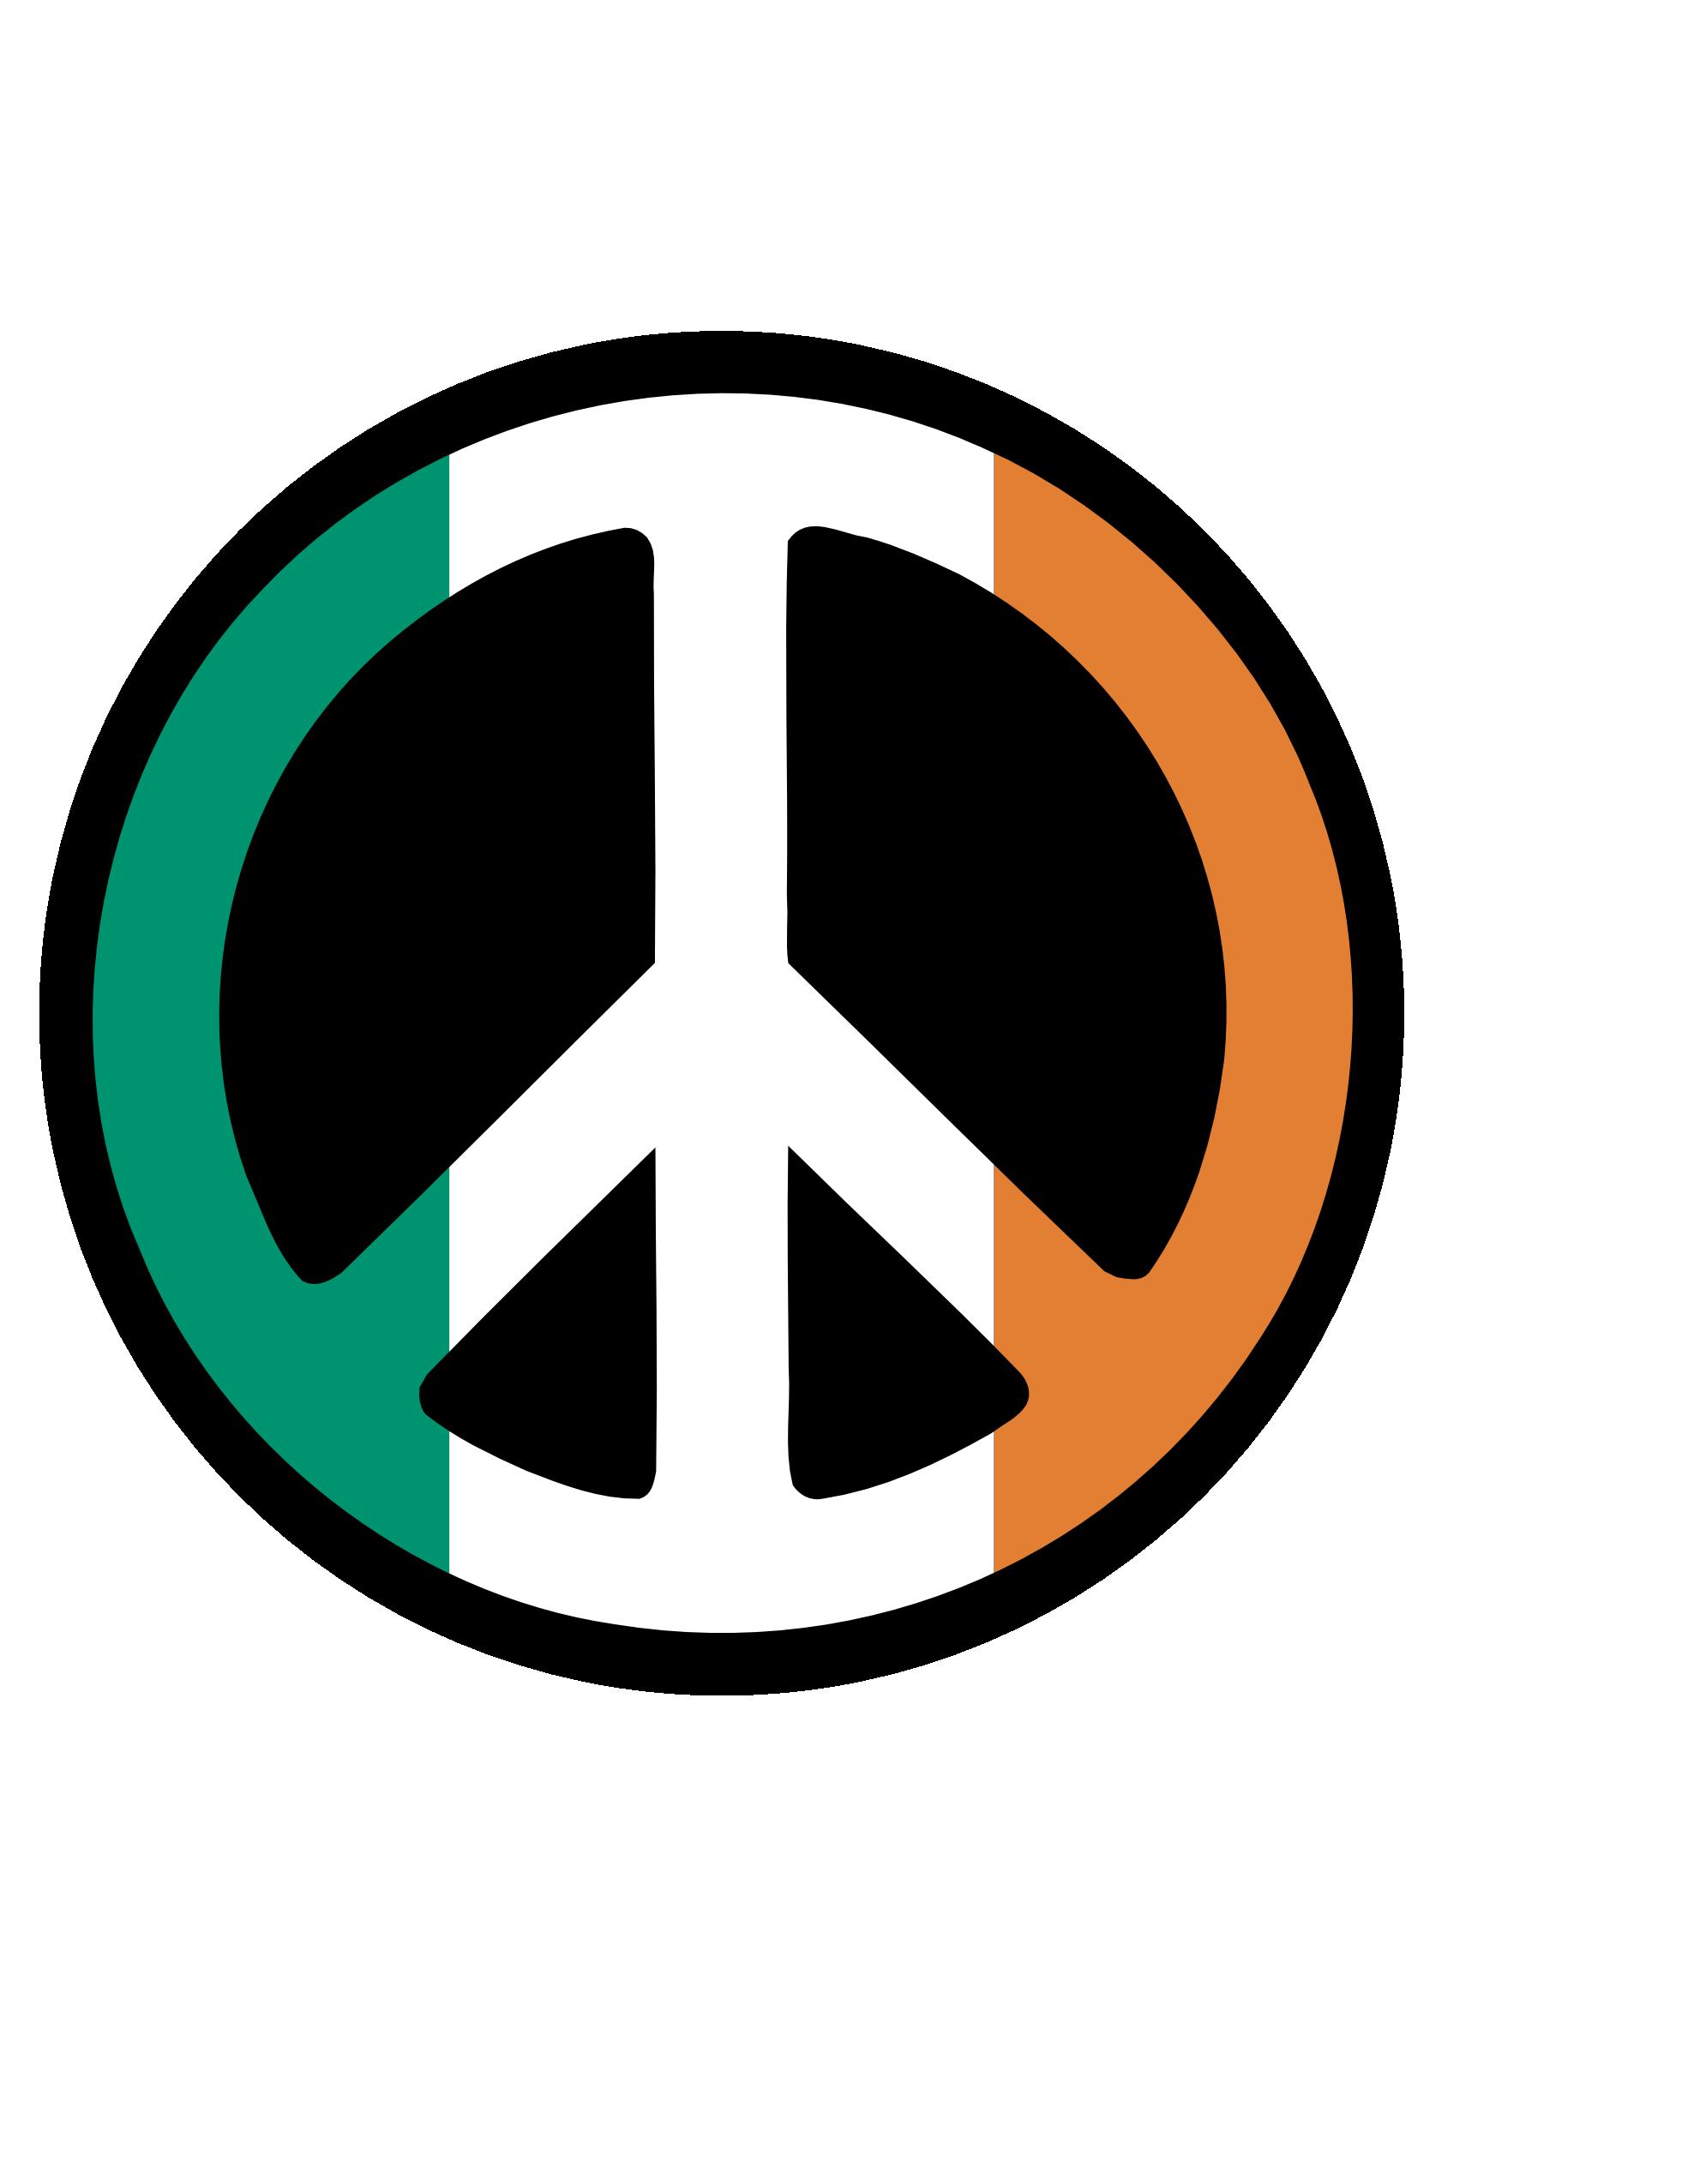 Irish Symbols Clipart - Clipart Kid